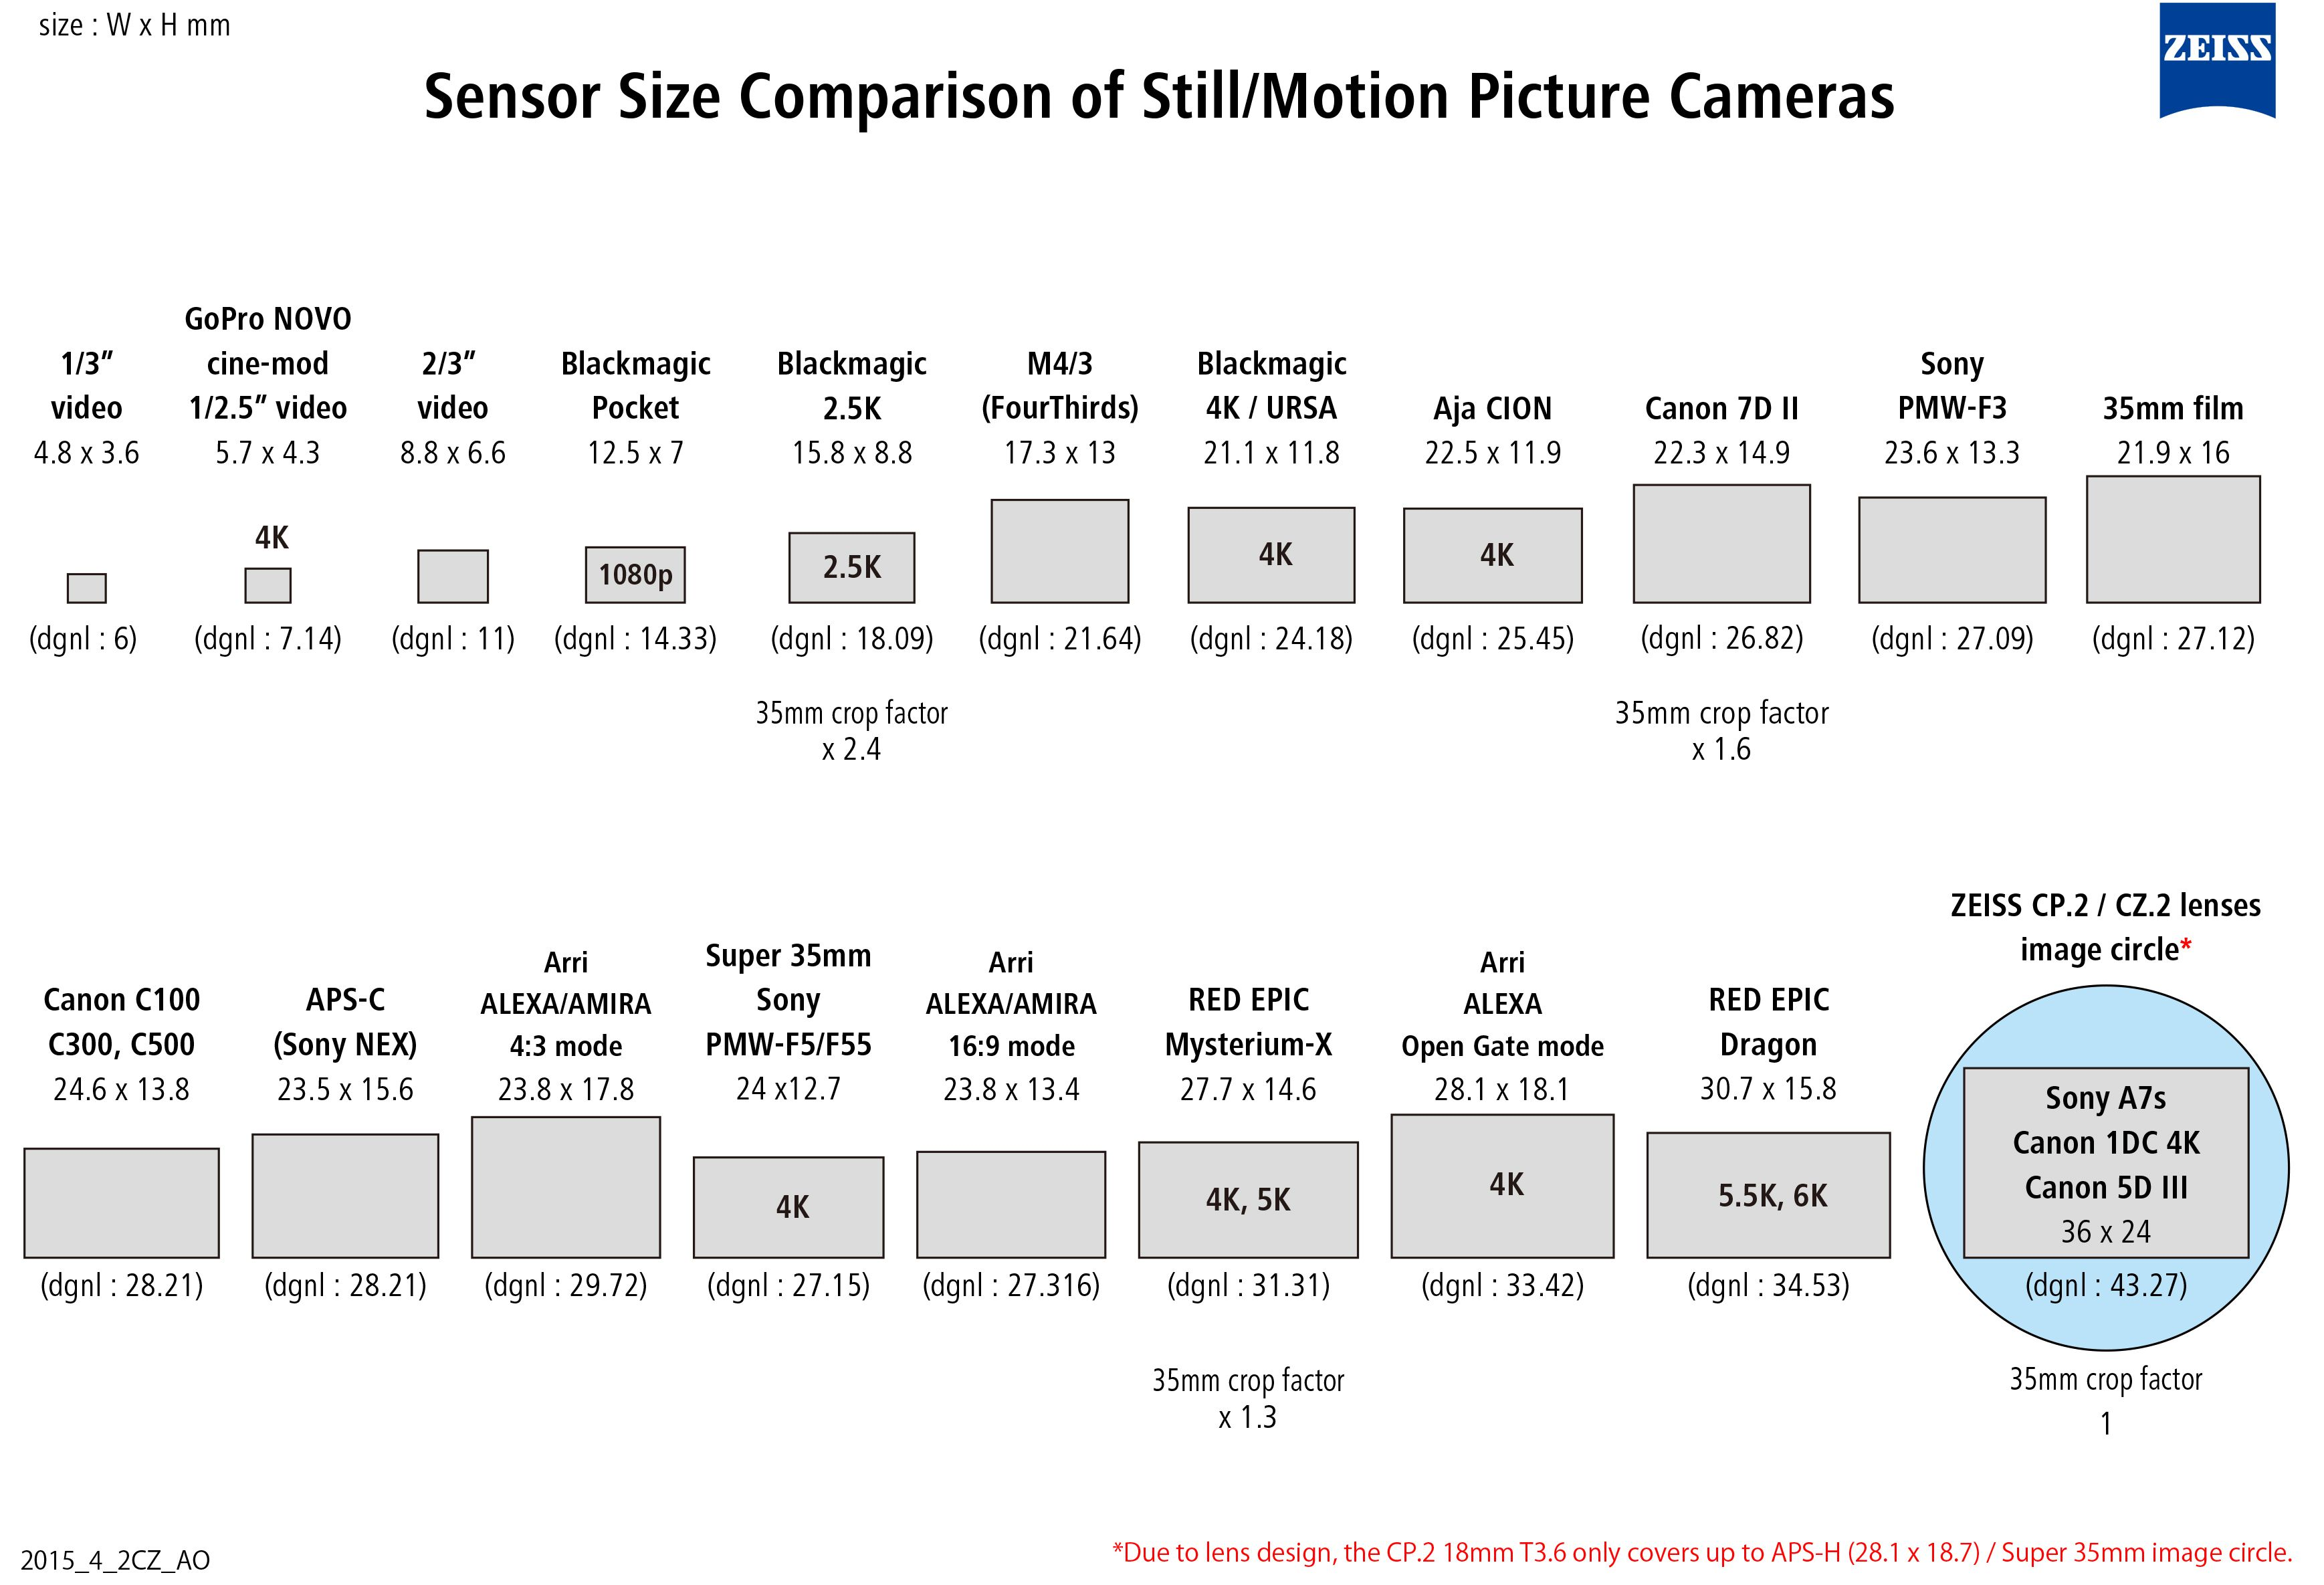 Video And Still Camera Sensor Sizes